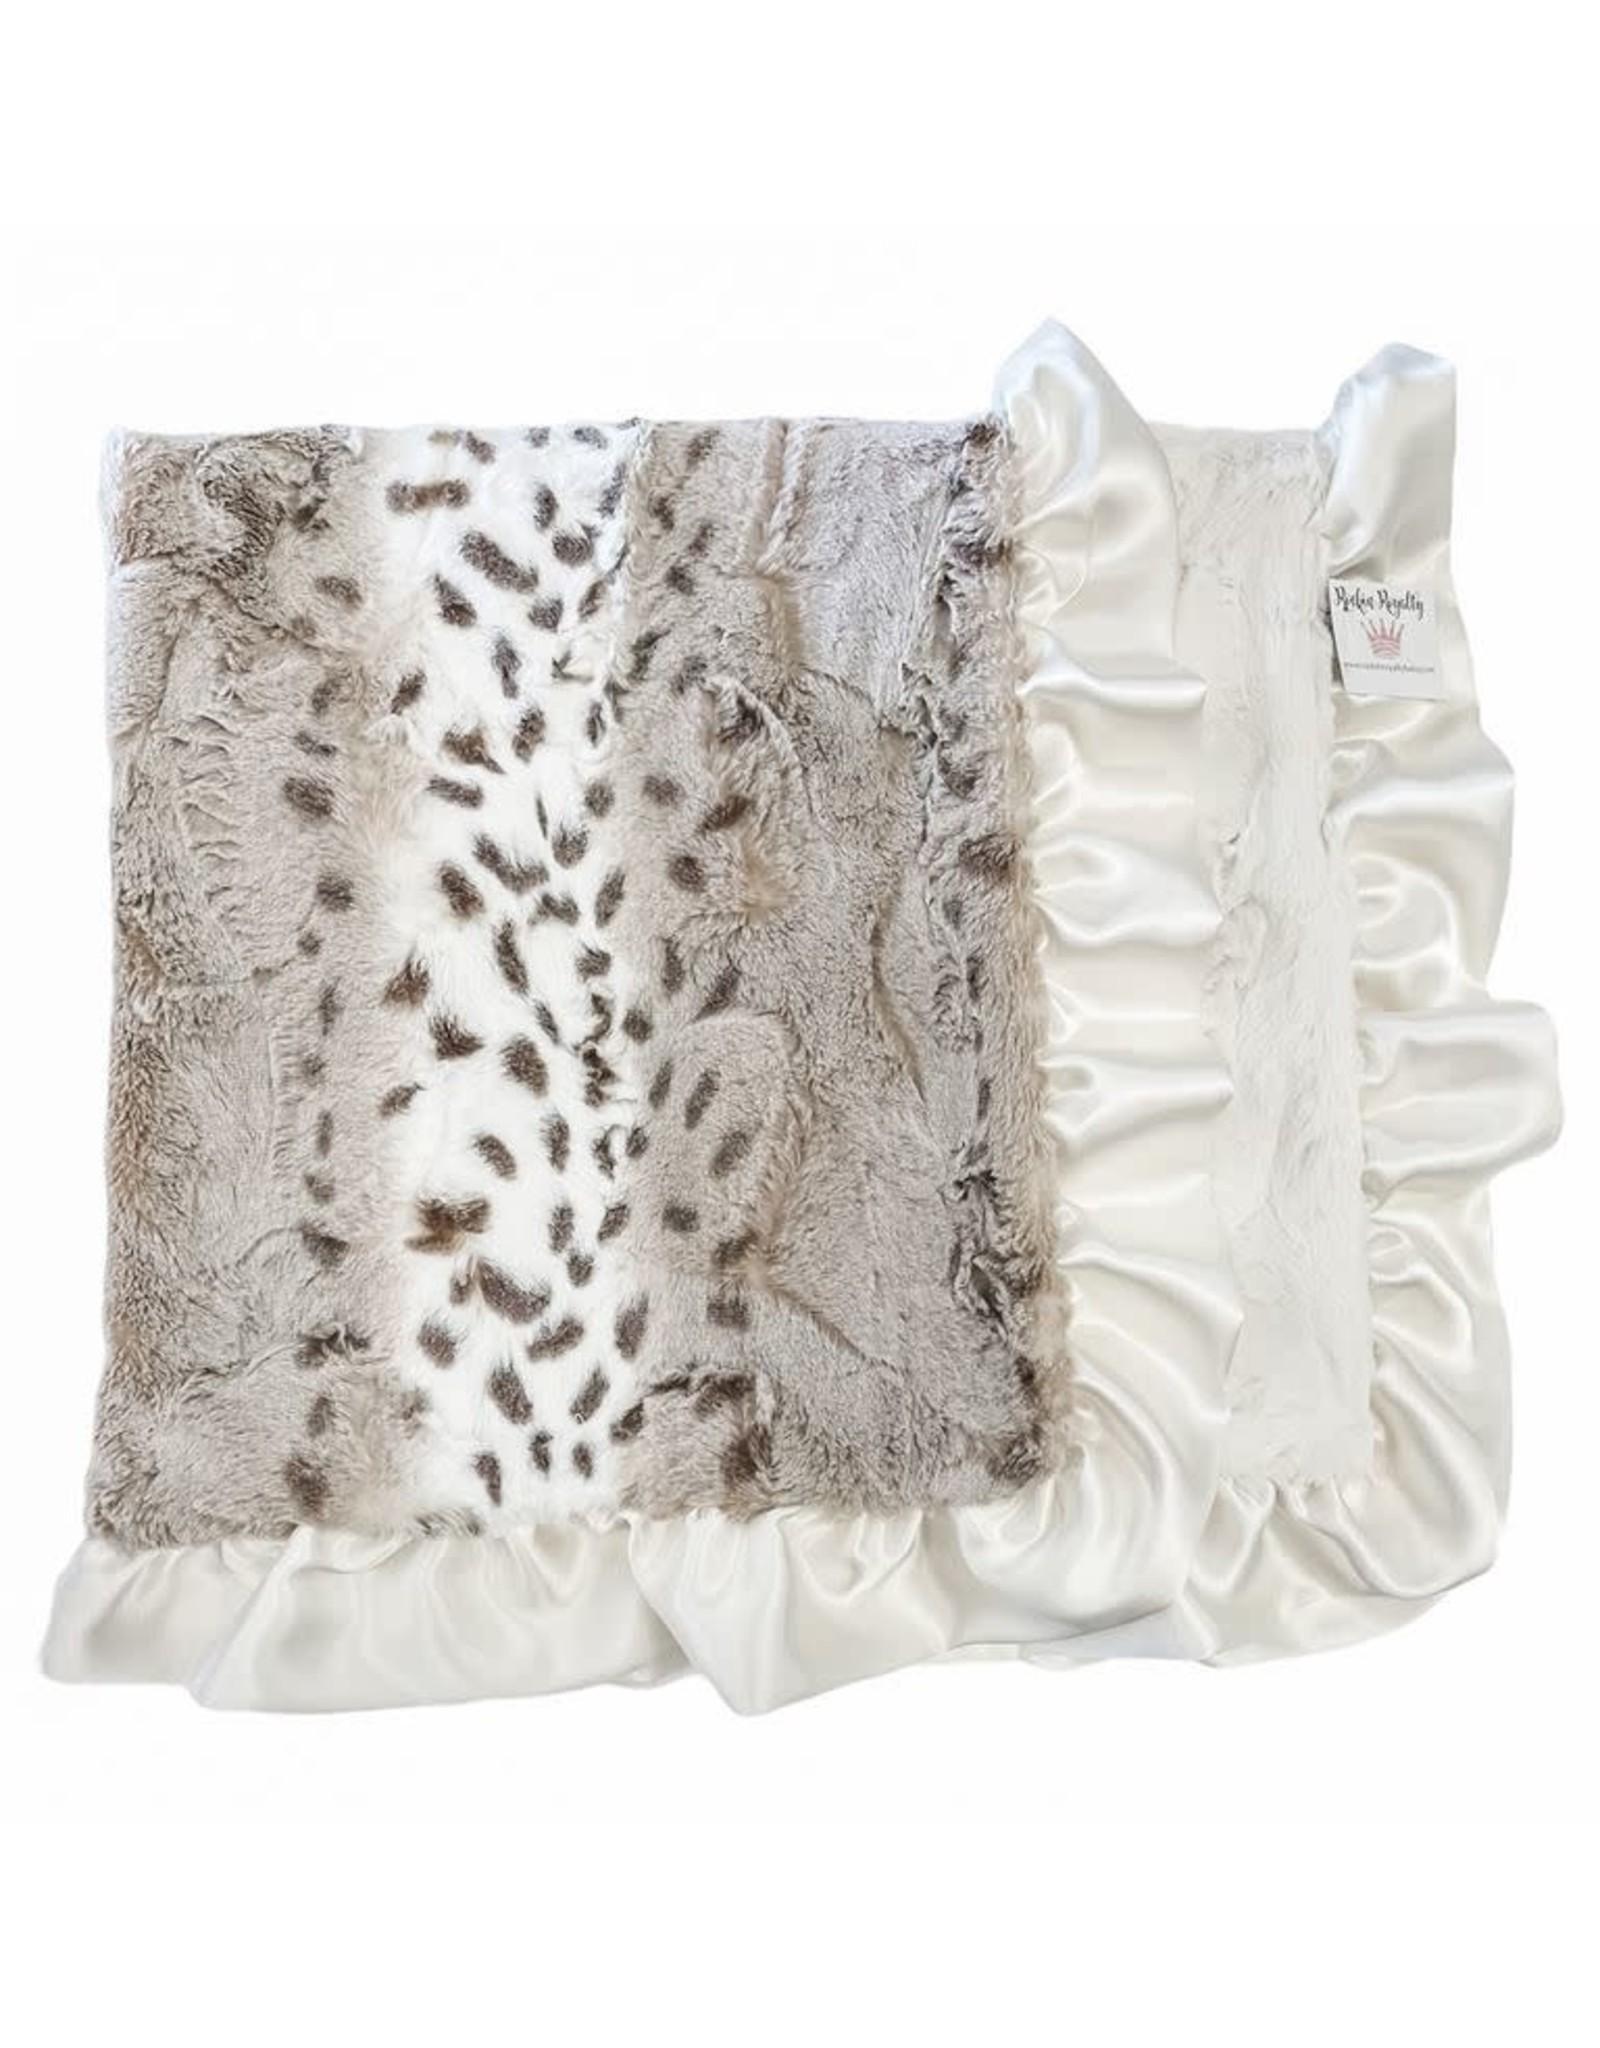 Rockin' Royalty Rockin Royalty- Snowcat Ivory Blanket